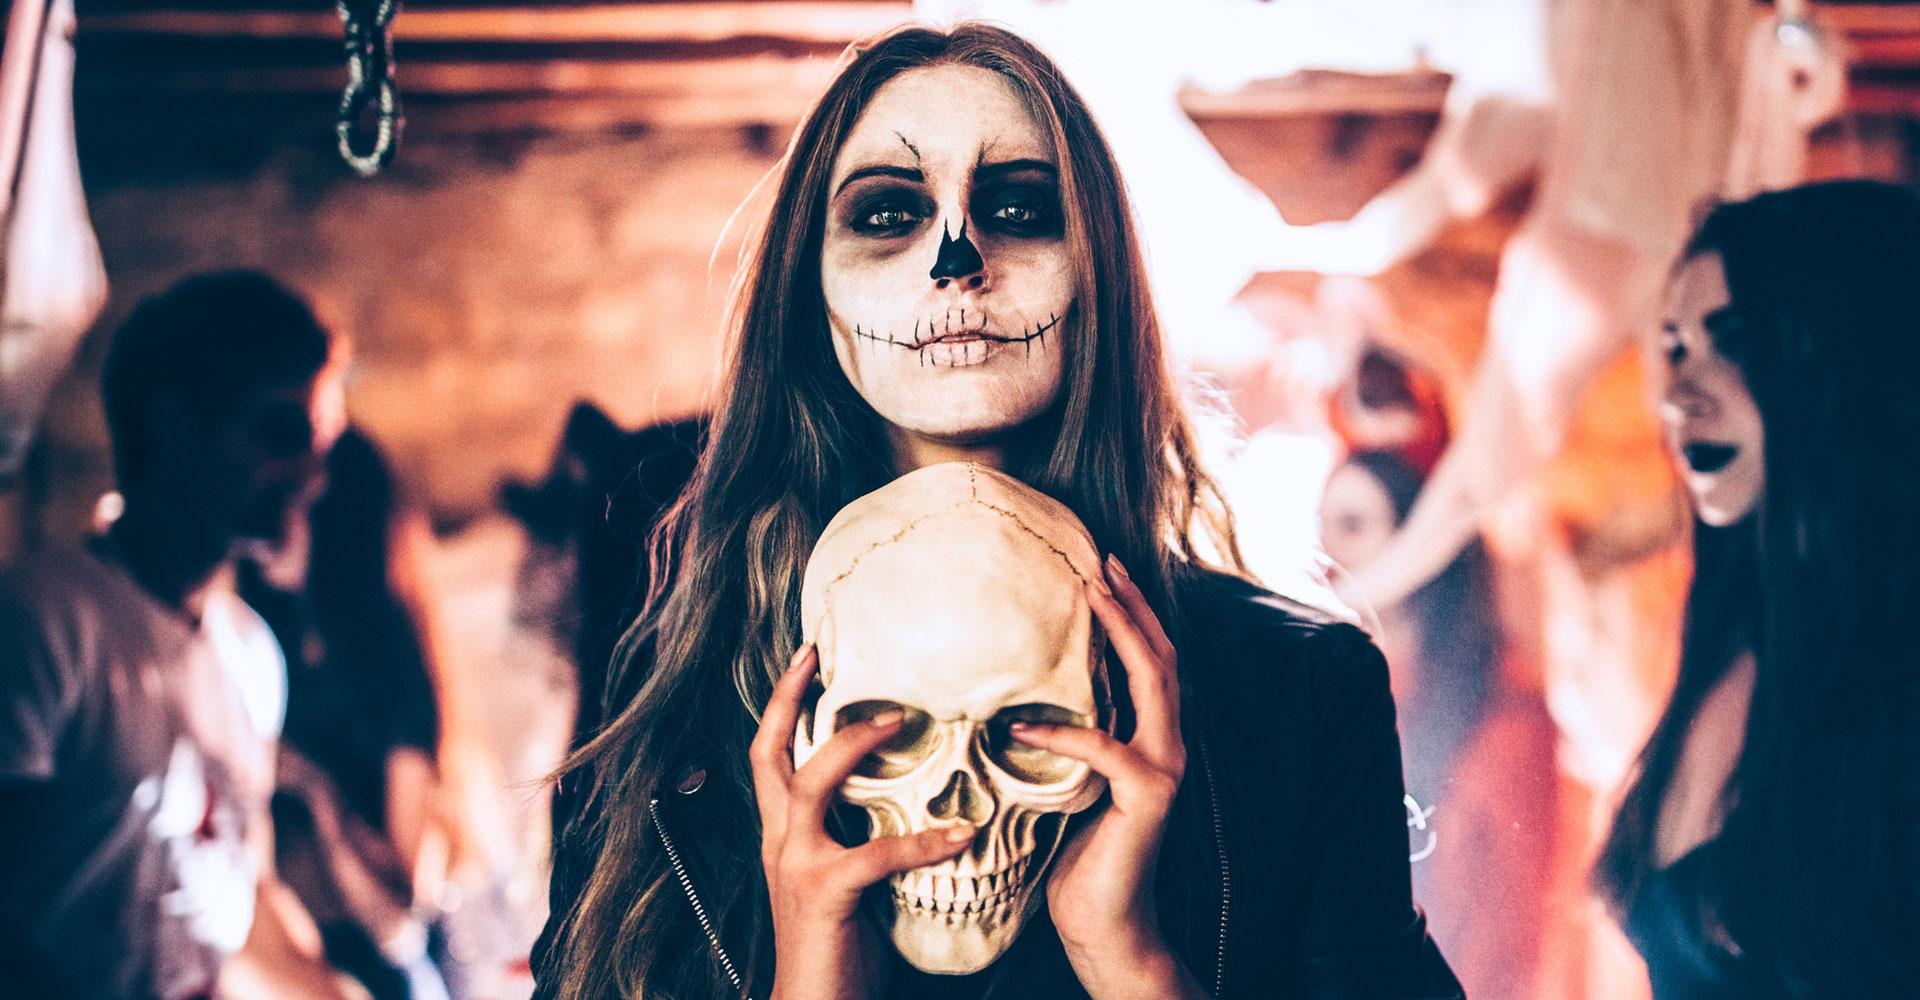 Halloween Schminken Ohne Kostum.Bestes Halloween Selfie Fur Instagram Facebook Und Co So Geht S